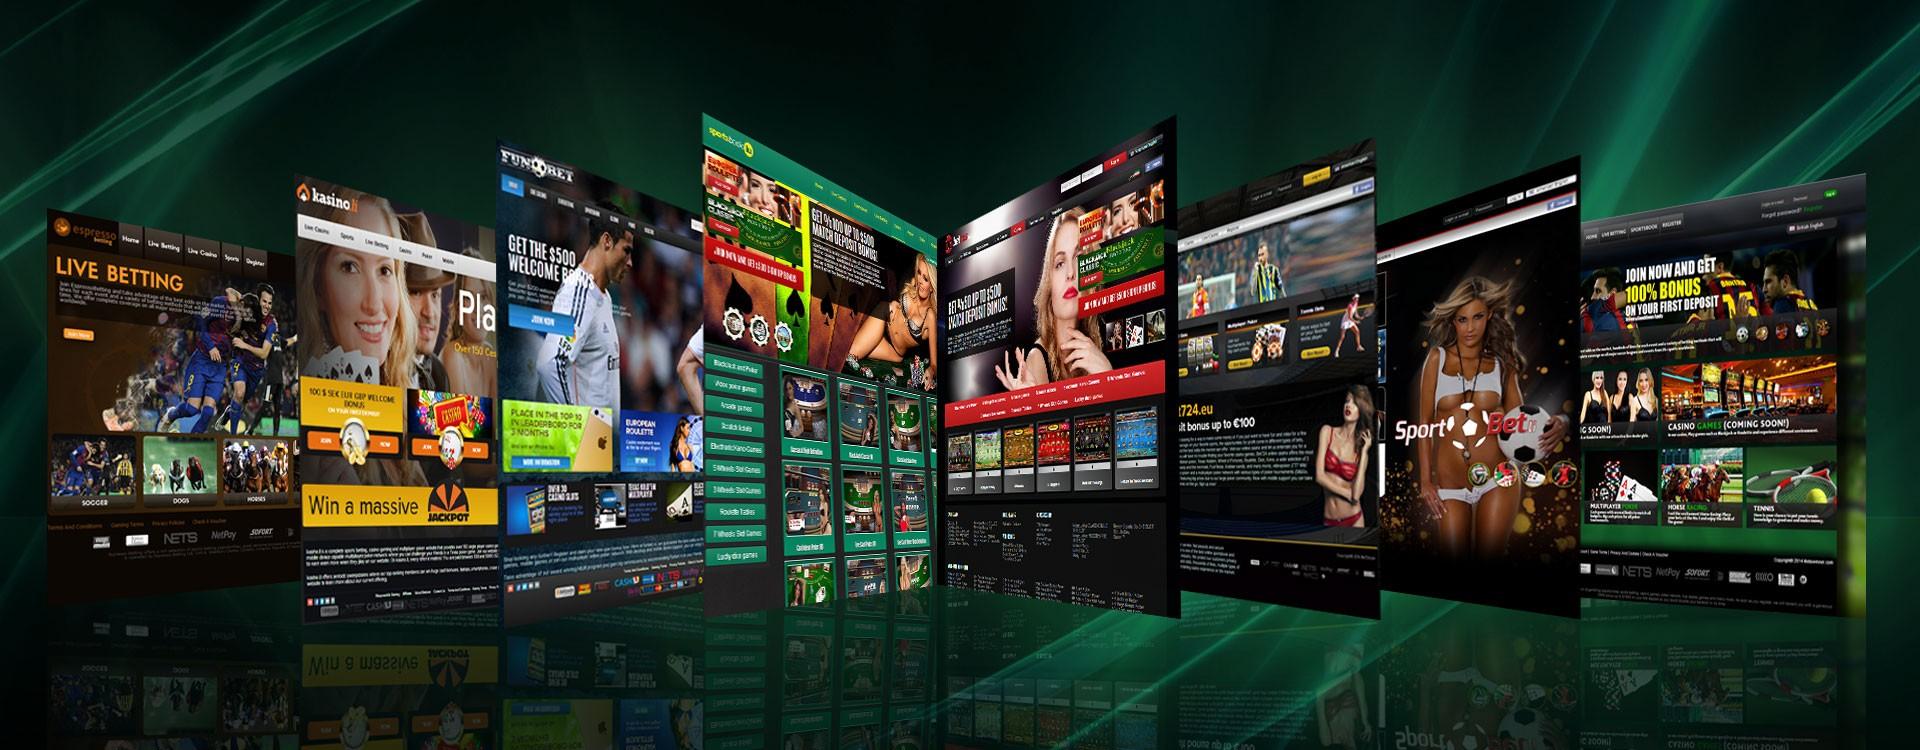 Sports Betting Sites 2021 - Tribune Online